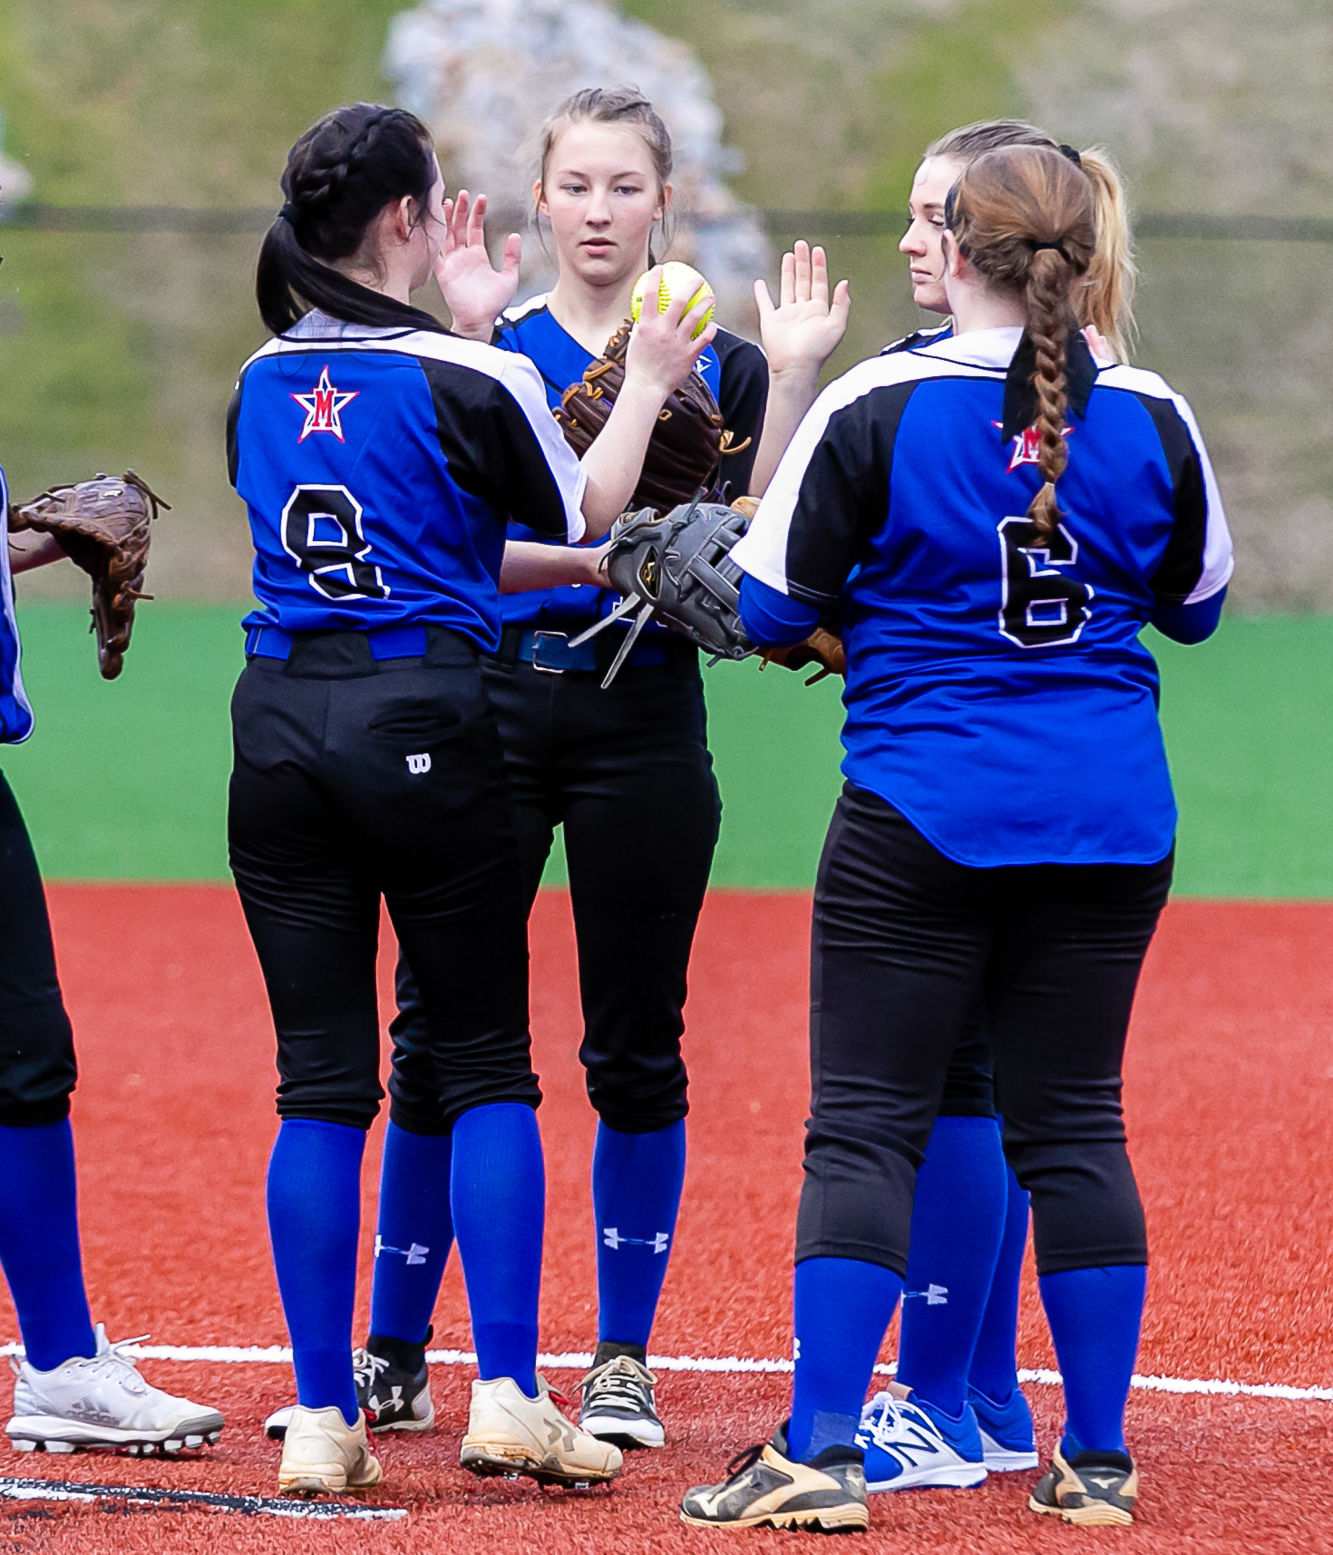 MHS softball 2019: Returners bolster Lady Titans' lineup